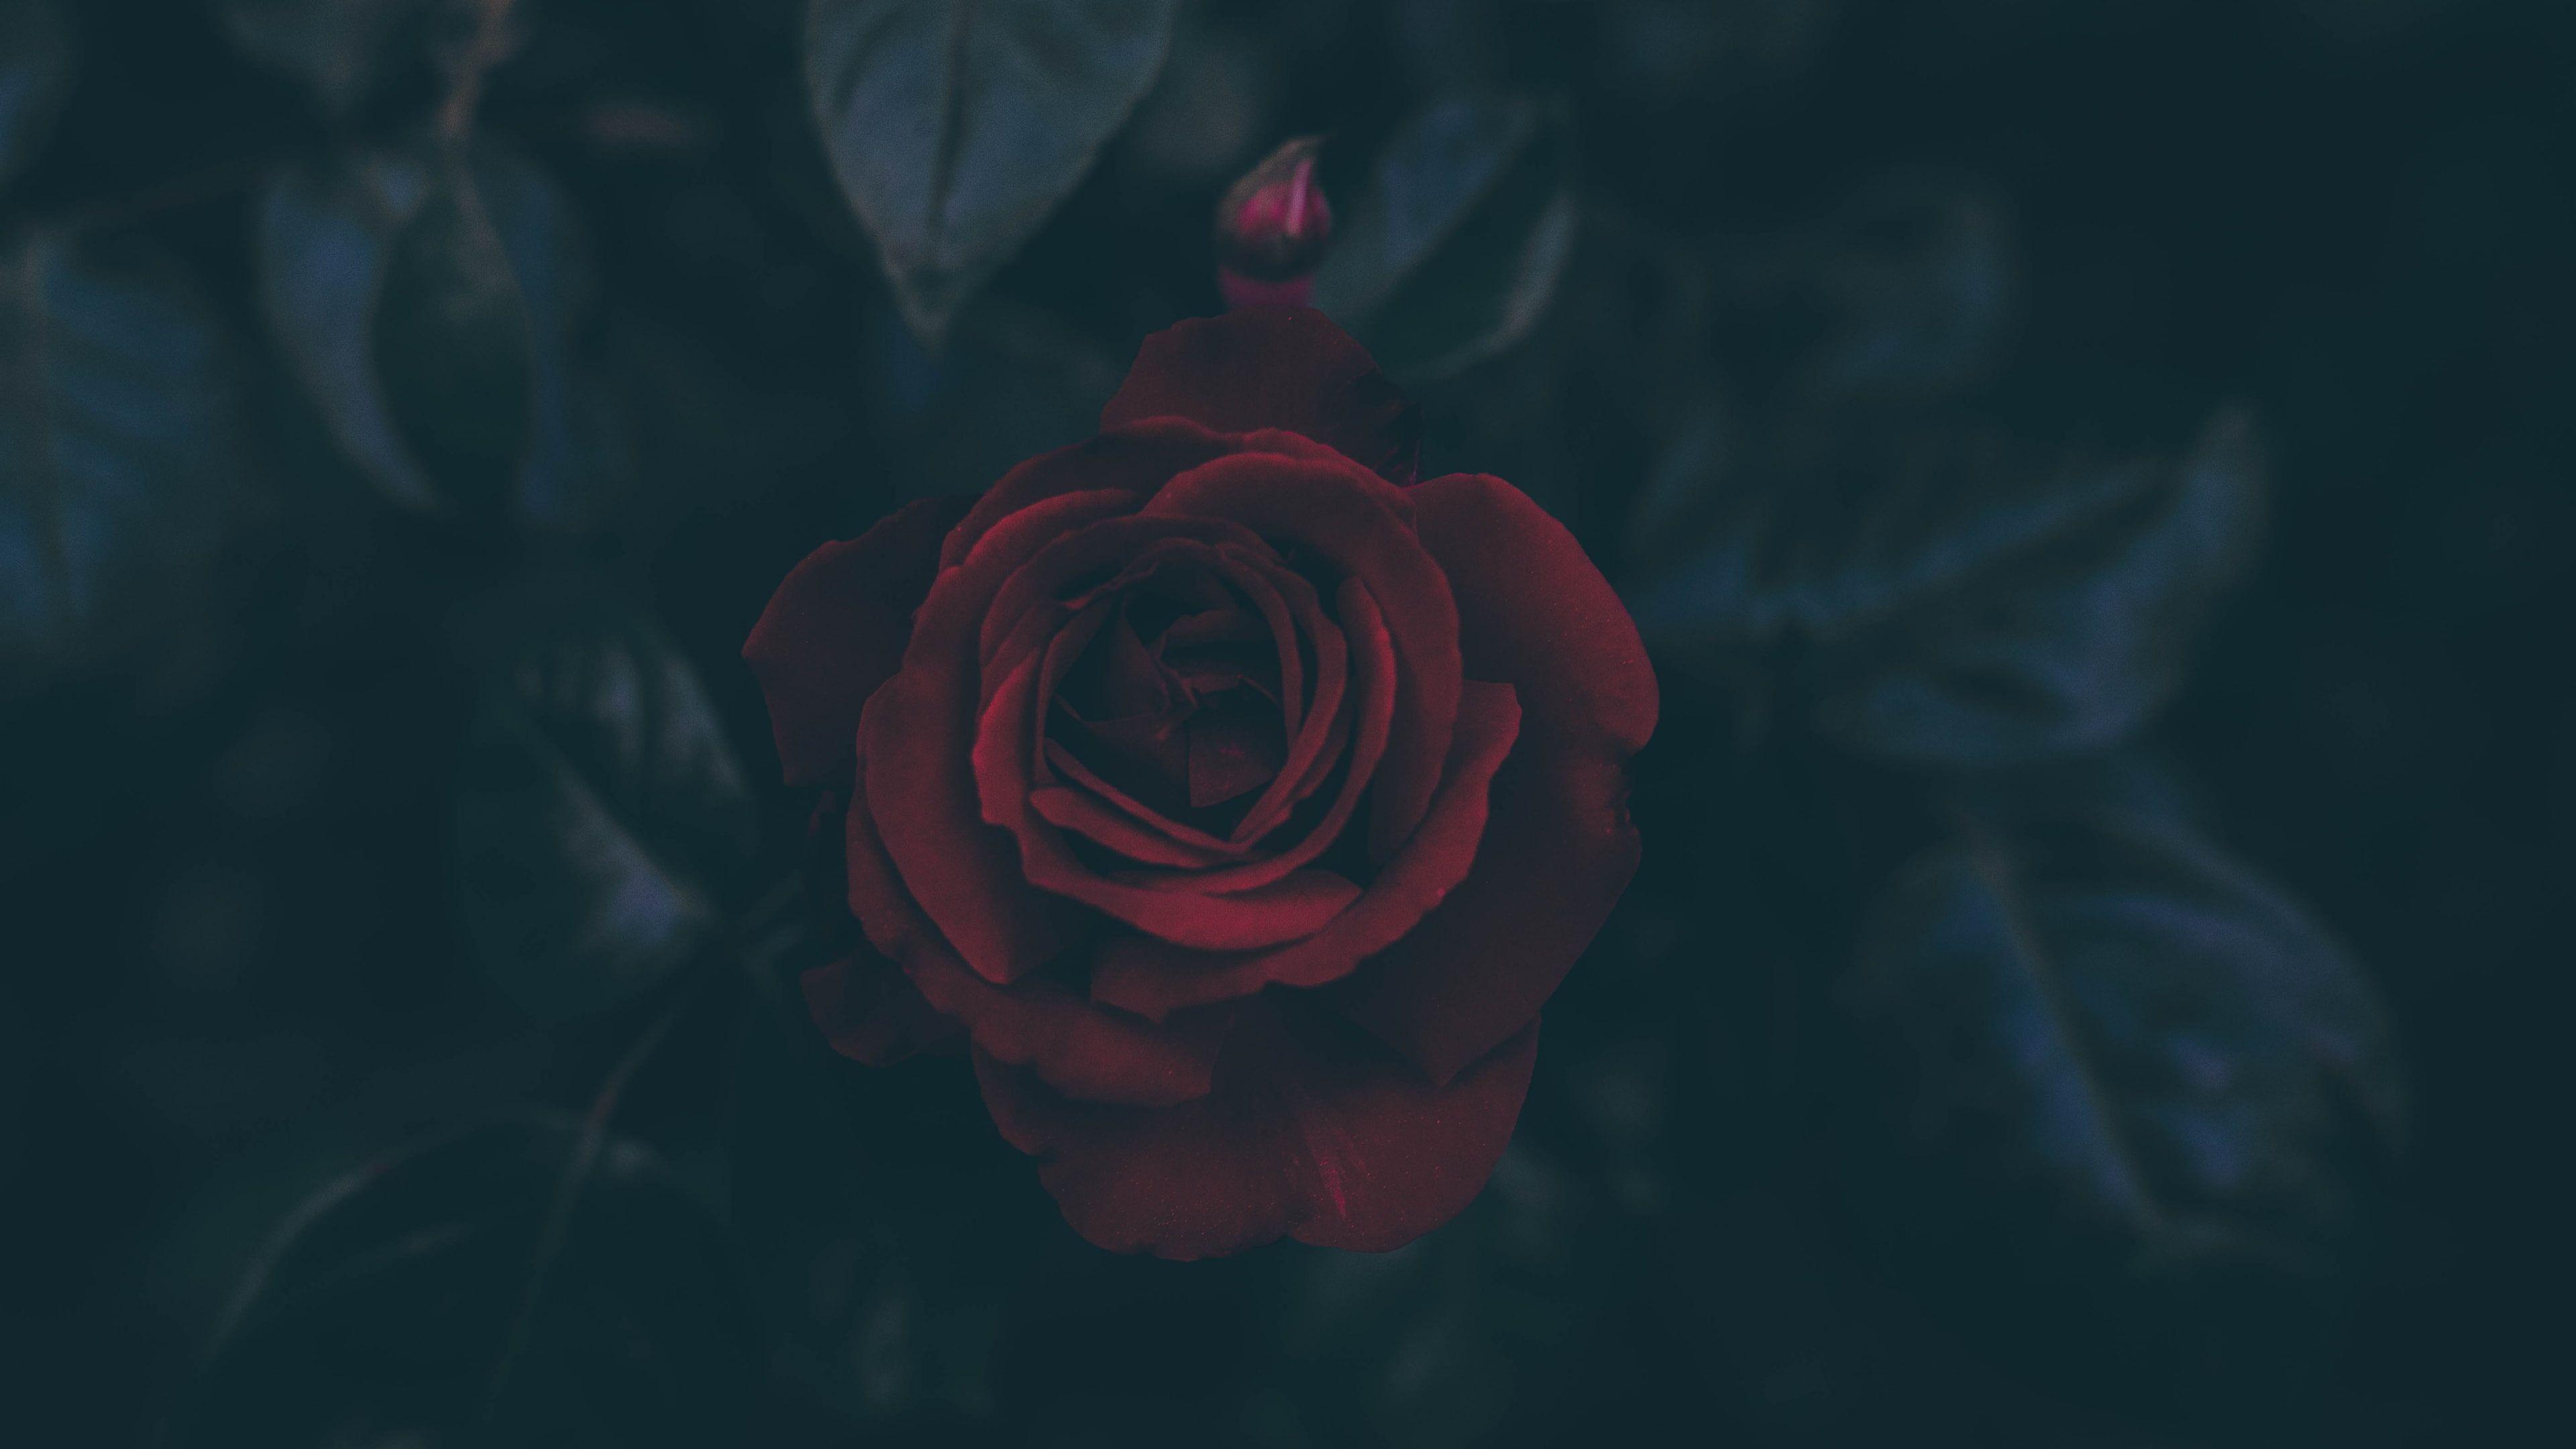 Dark Flowers Leaves Petals Red Flowers Rose 4k Wallpaper Hdwallpaper Desktop Rose Illustration Red Rose Flower Rose Wallpaper